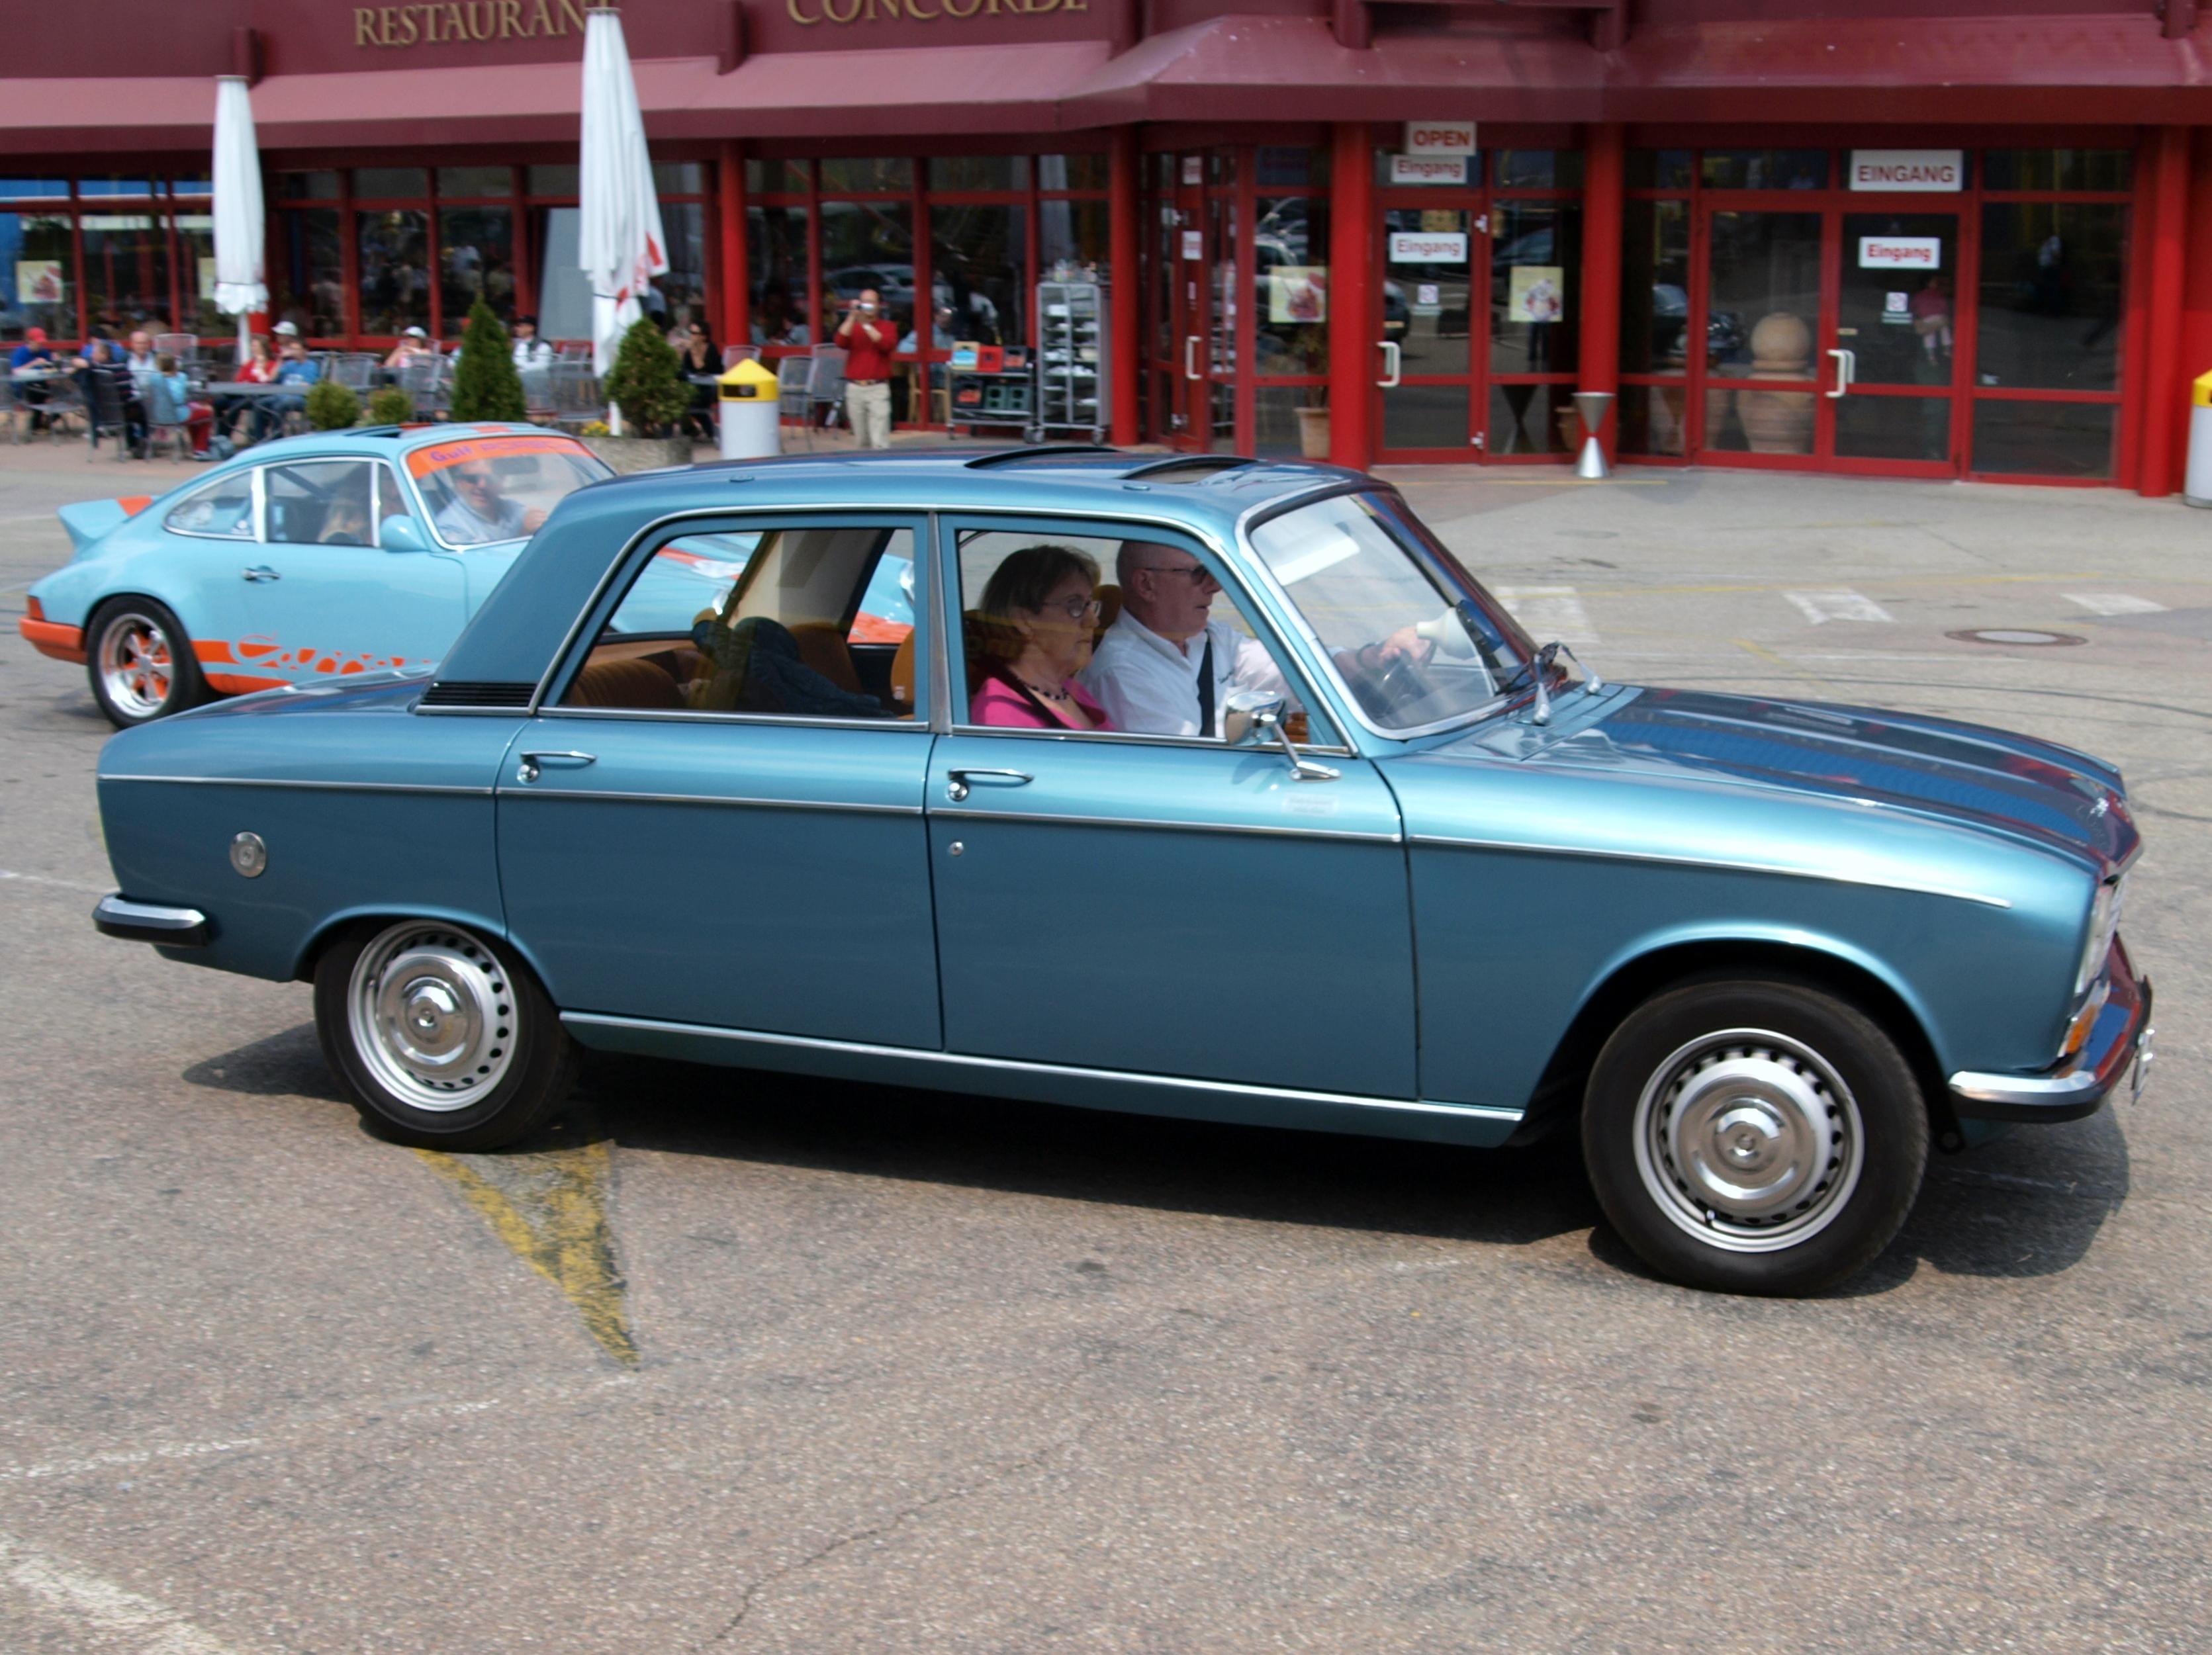 File:Peugeot 304 SLS (1976) p2.JPG